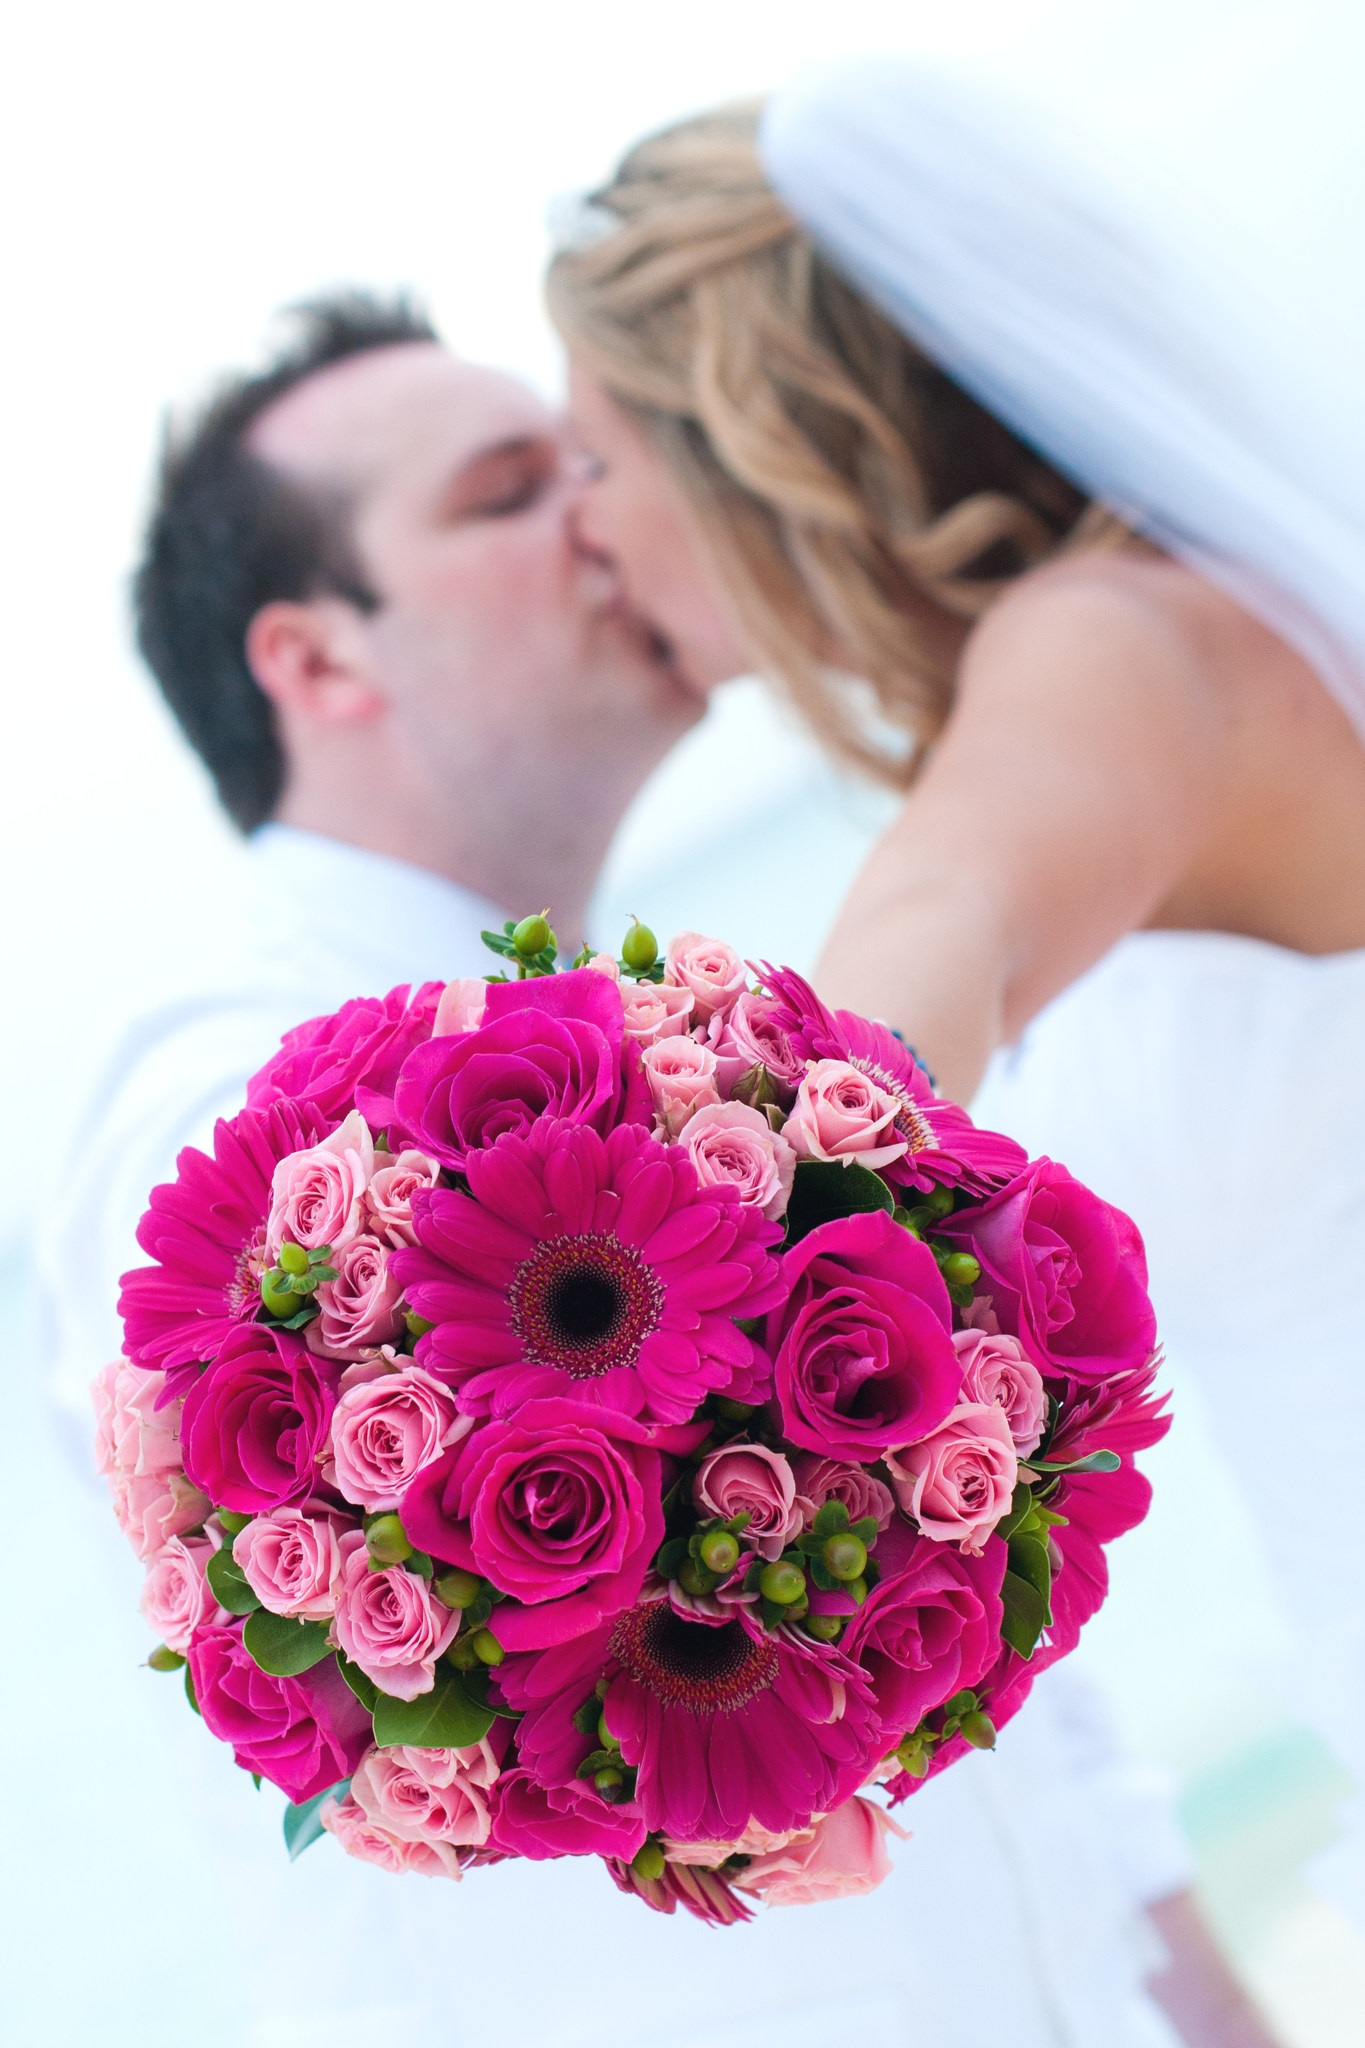 Wedding-bouquet-pinks-with-green-berries.jpg